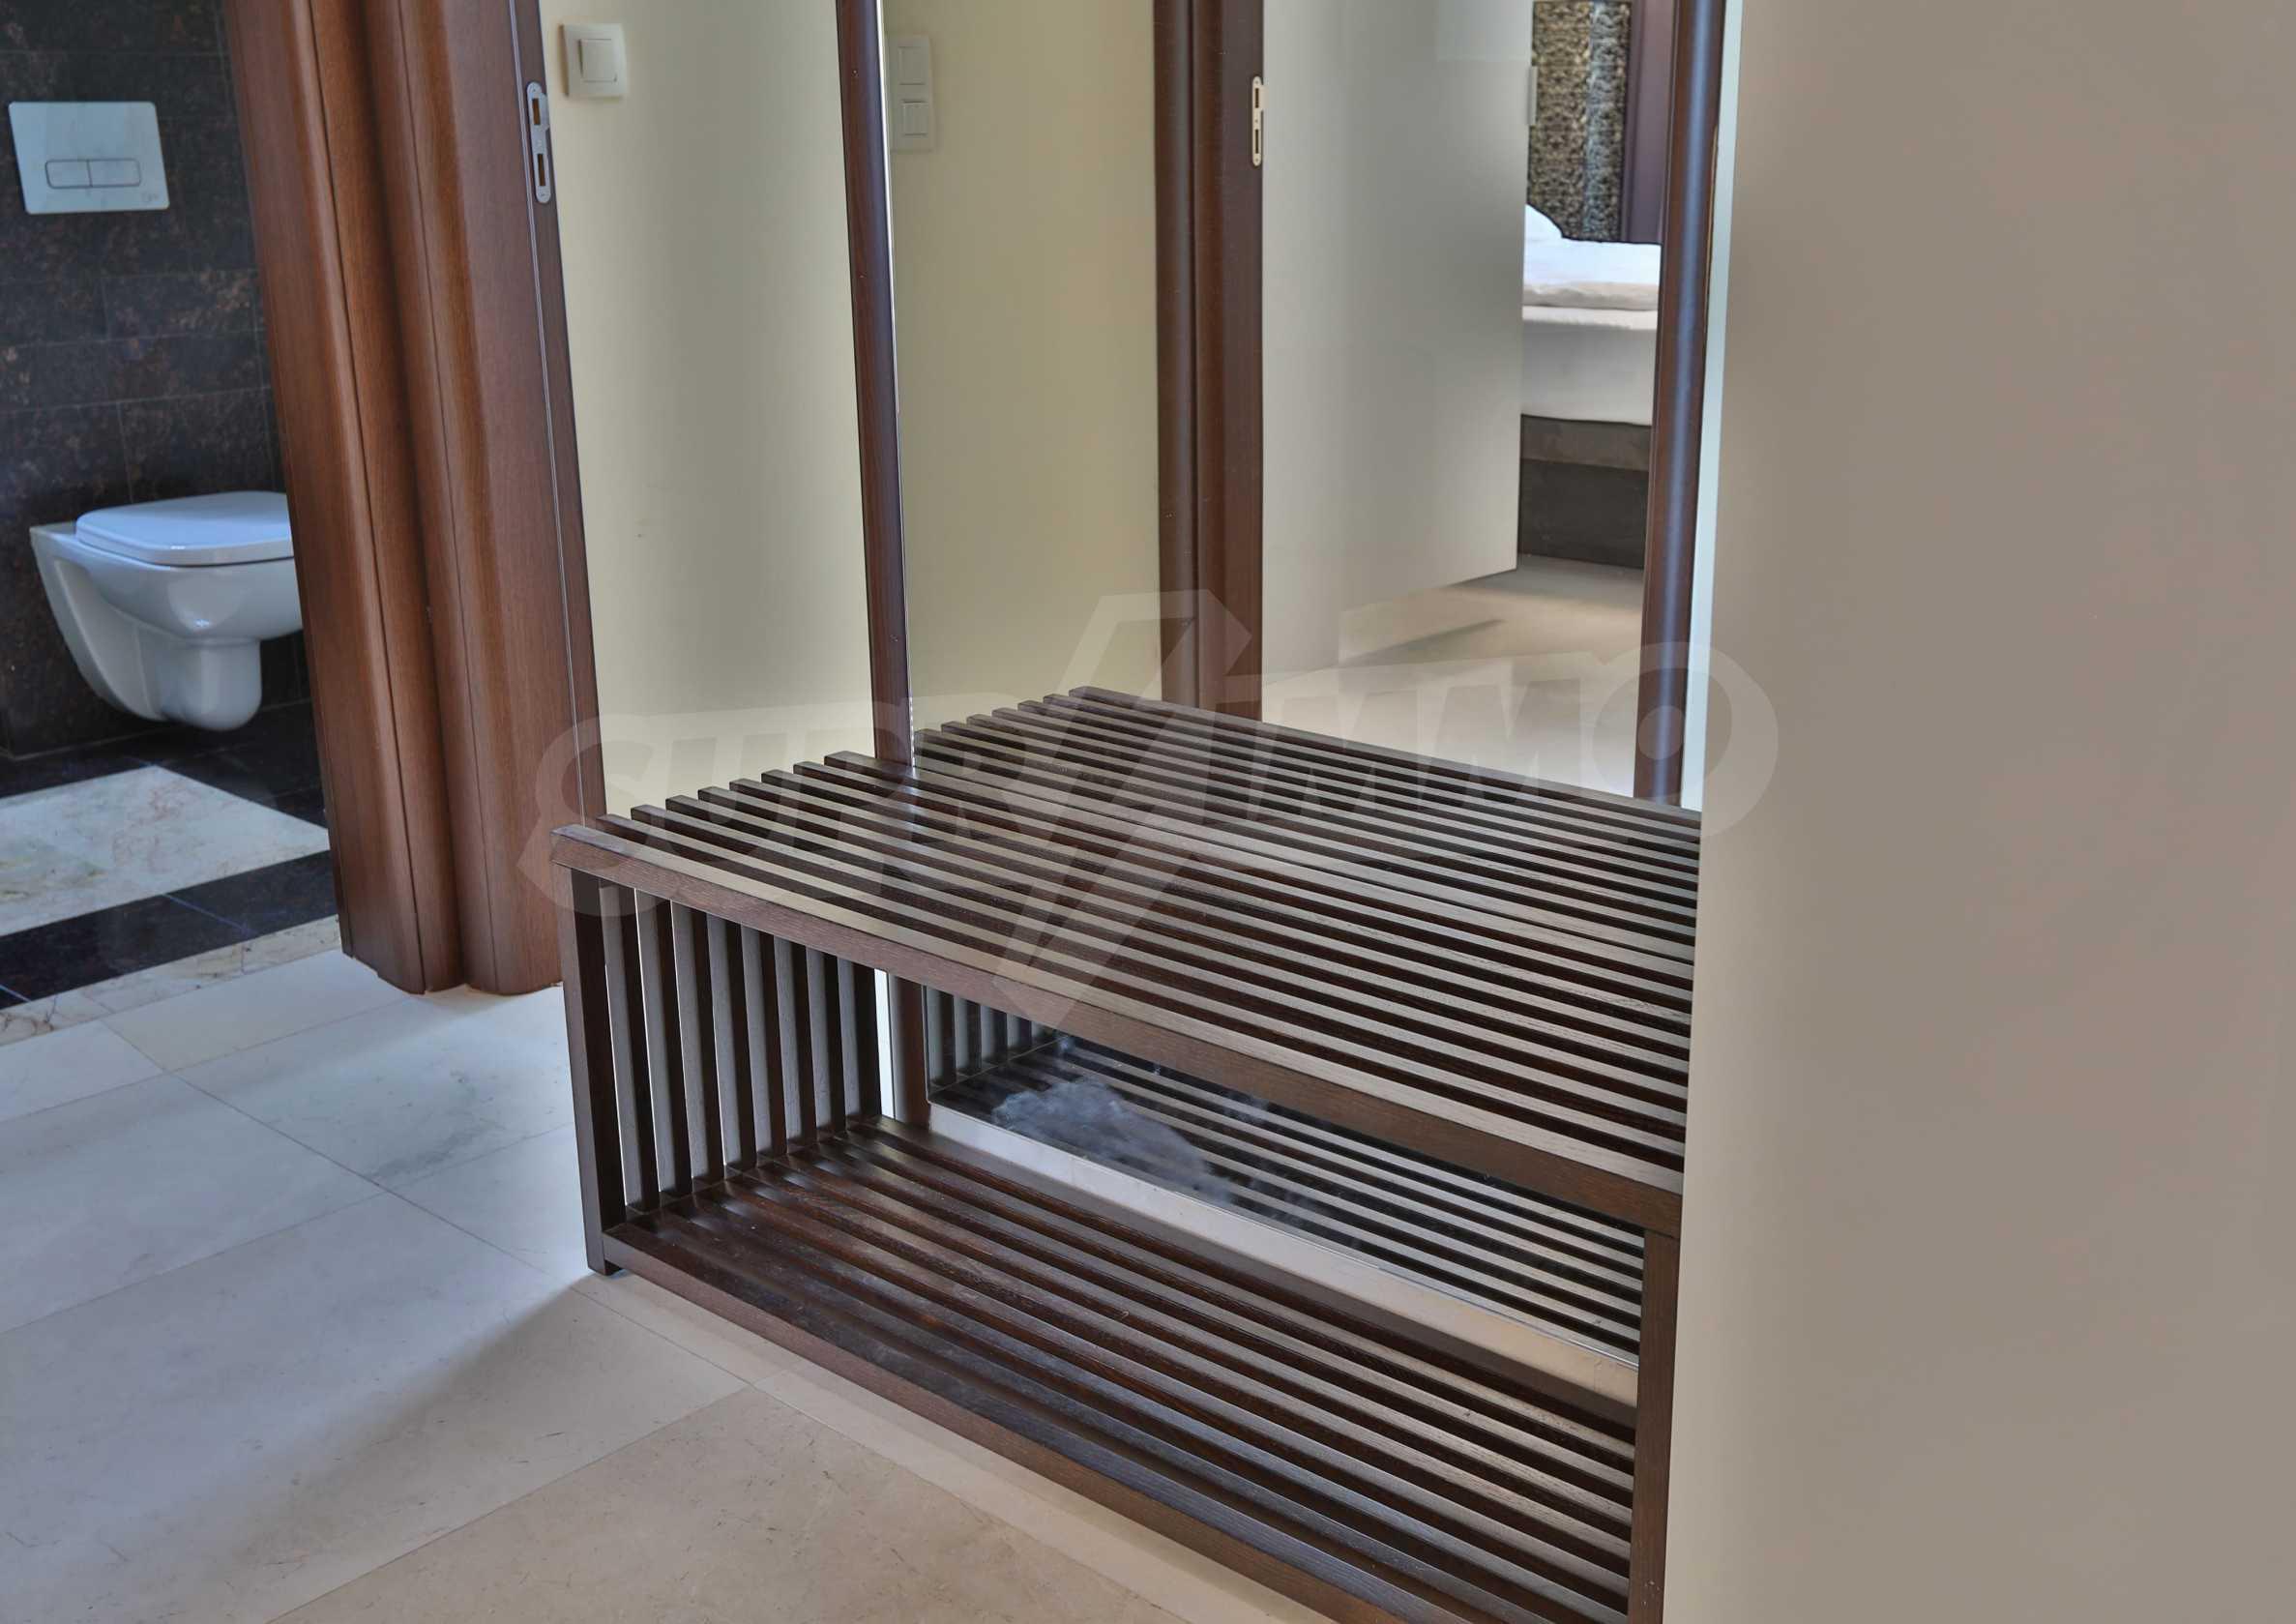 Дизайнерски тристаен апартамент под наем за летен сезон в резиденция Belle Époque в Лозенец 28